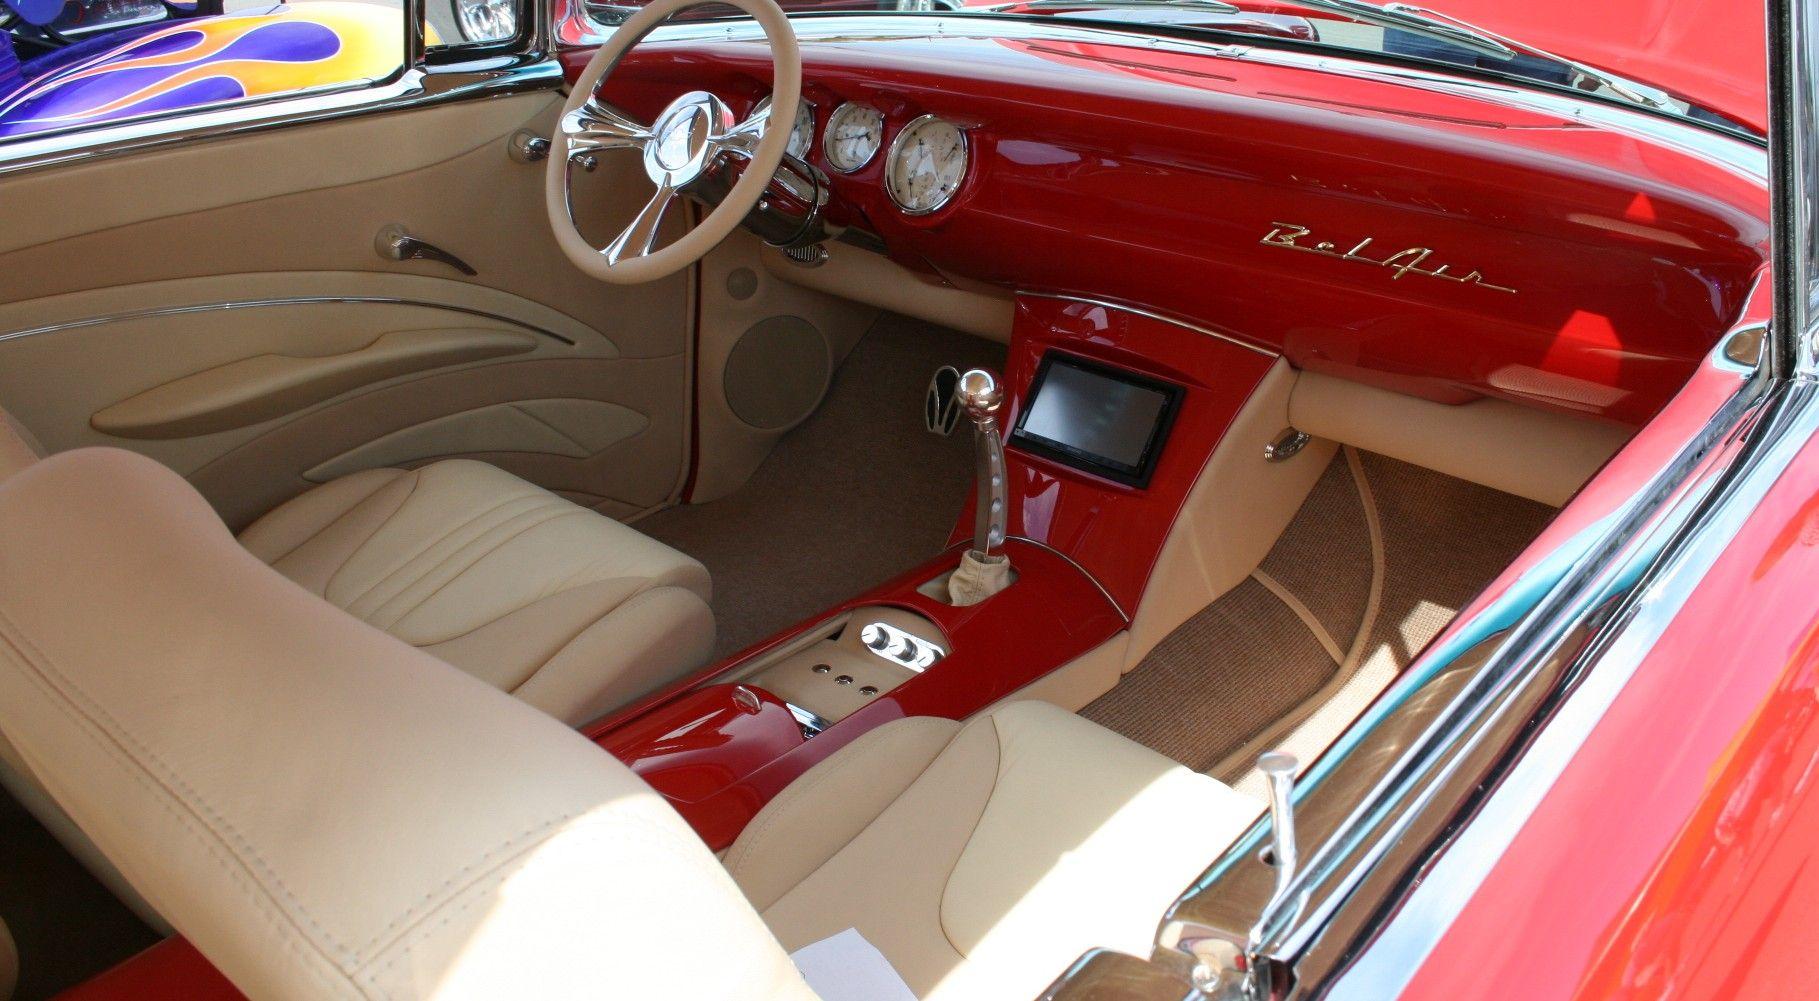 Custom Interior 57 Chevy Bel Air Google Search 57 Chevy Bel Air Chevy Bel Air Custom Center Console